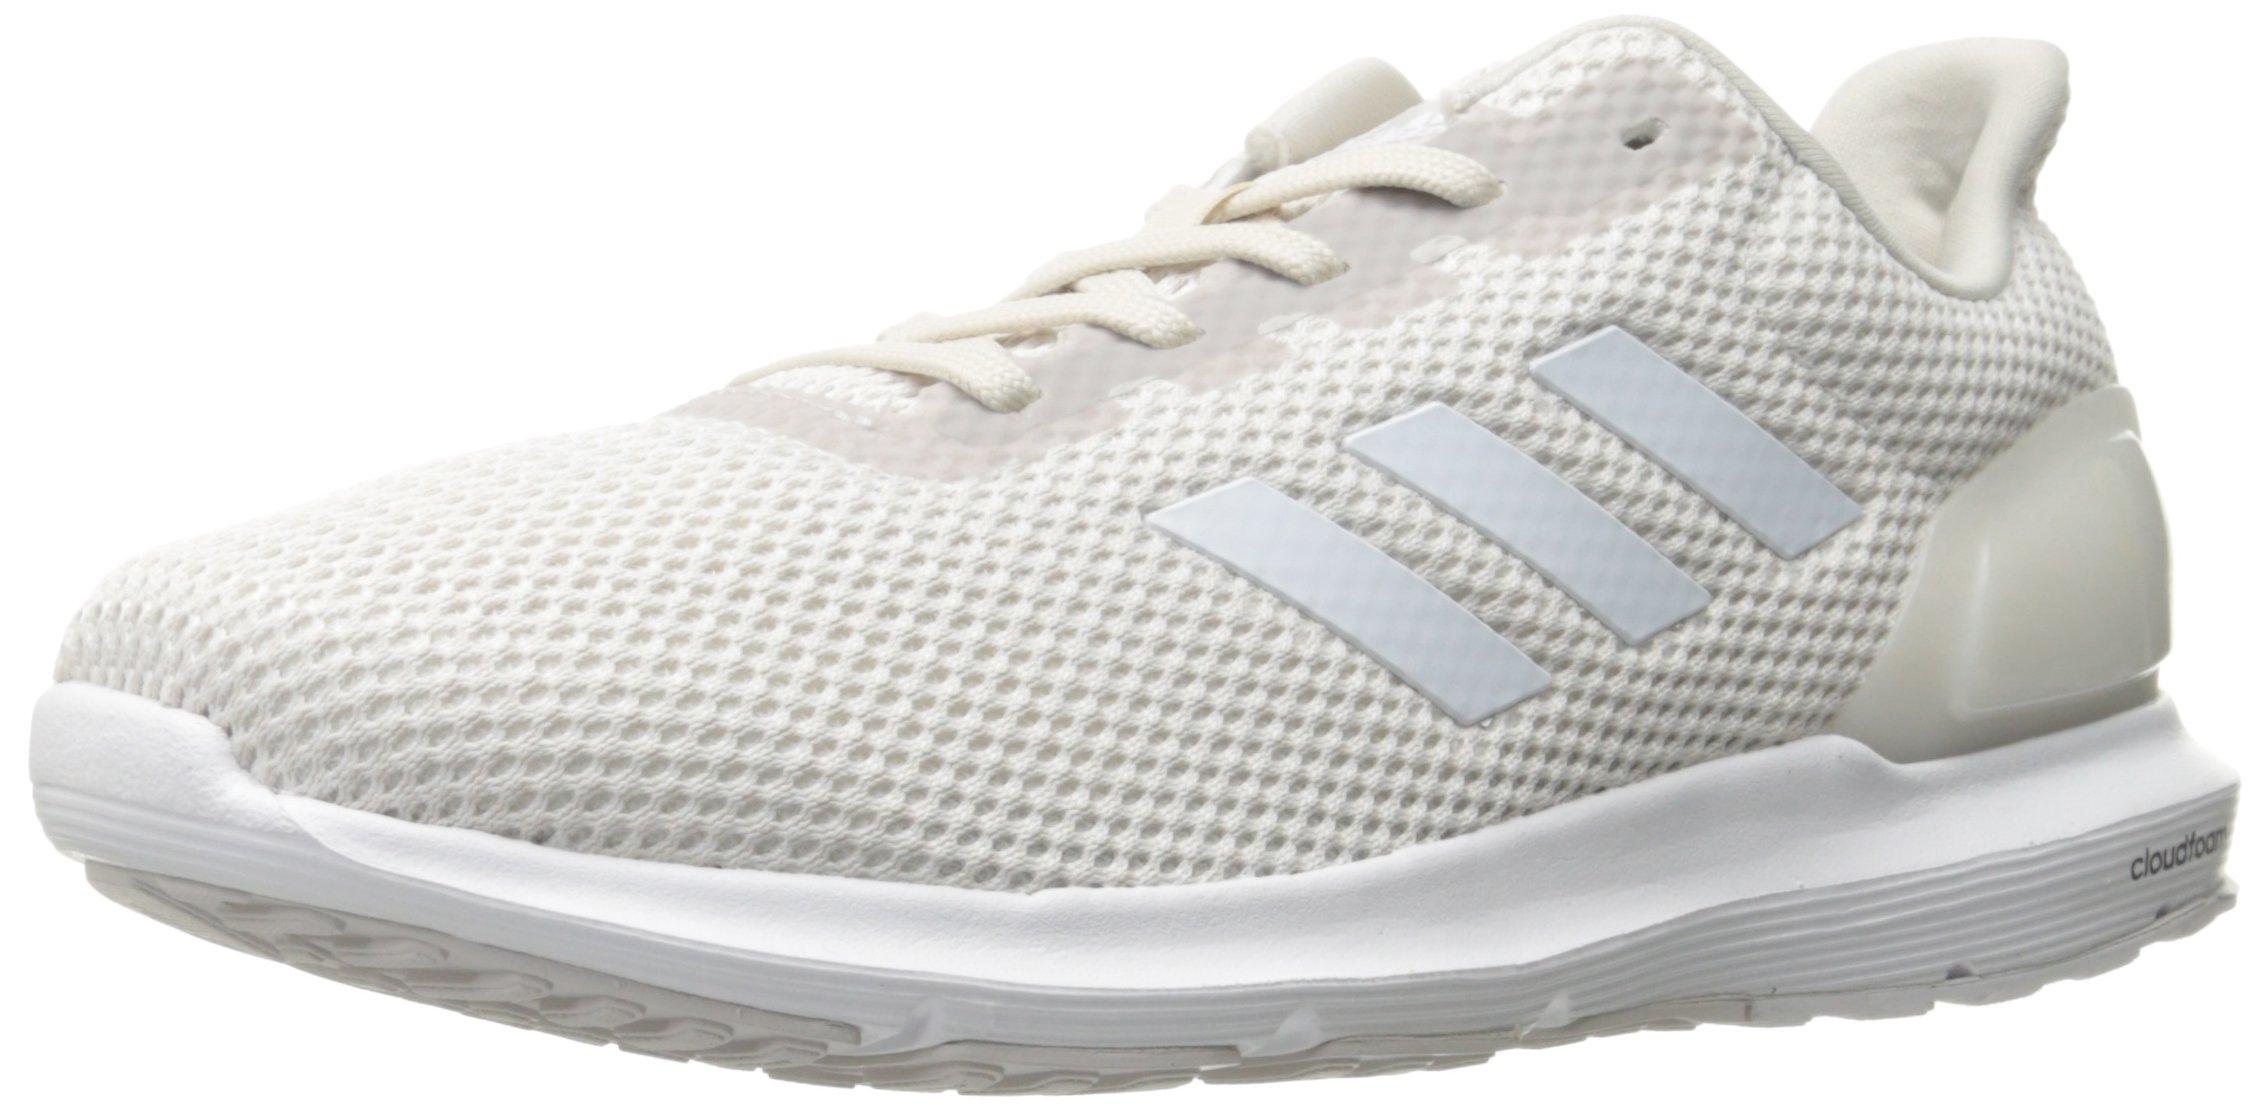 size 40 0cf6e dc9c4 Galleon - Adidas Women s Cosmic 2 Sl W Running Shoe Black White, 8 Medium US